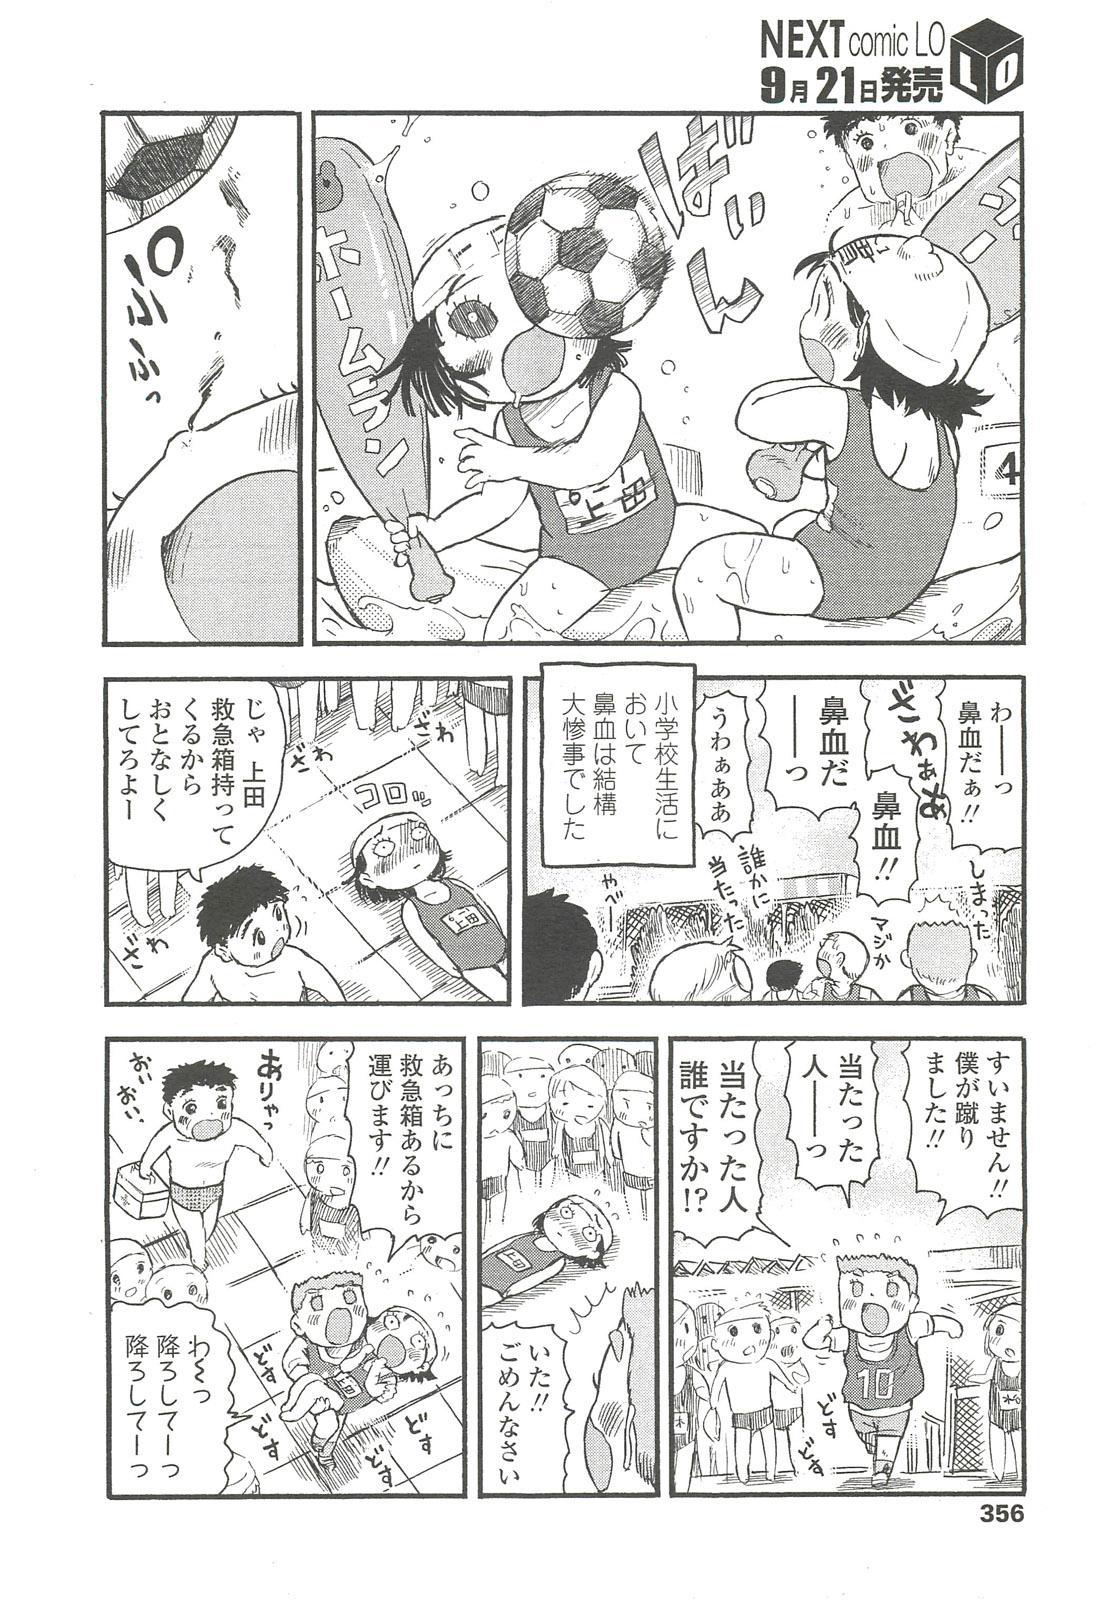 COMIC LO 2010-10 Vol. 79 354